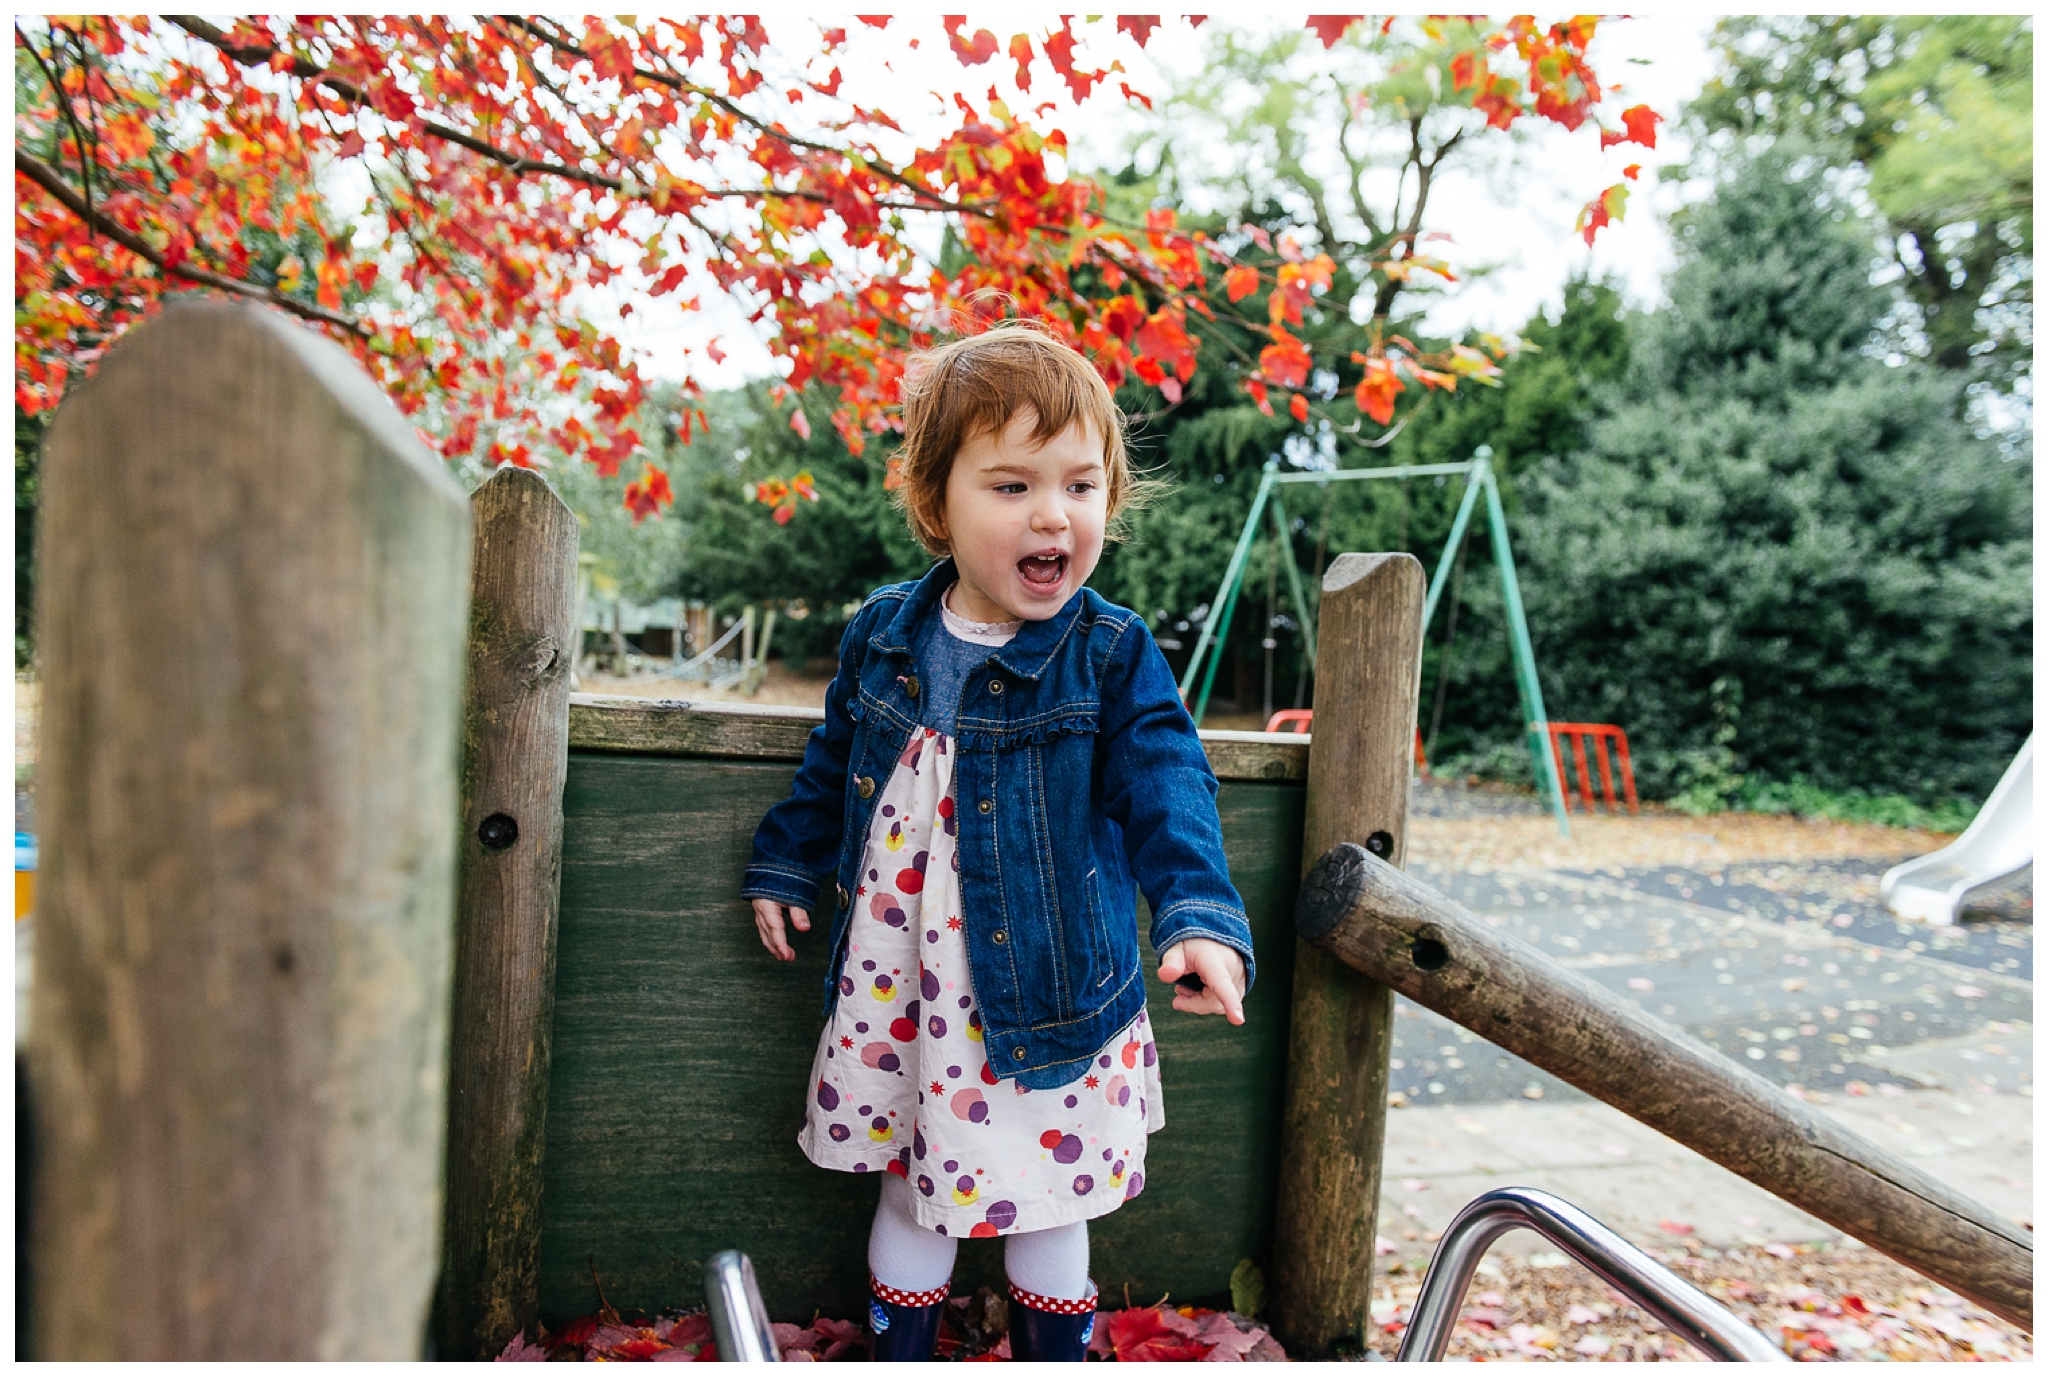 Autumn-family-portraits-birmingham-photographer_0007.jpg